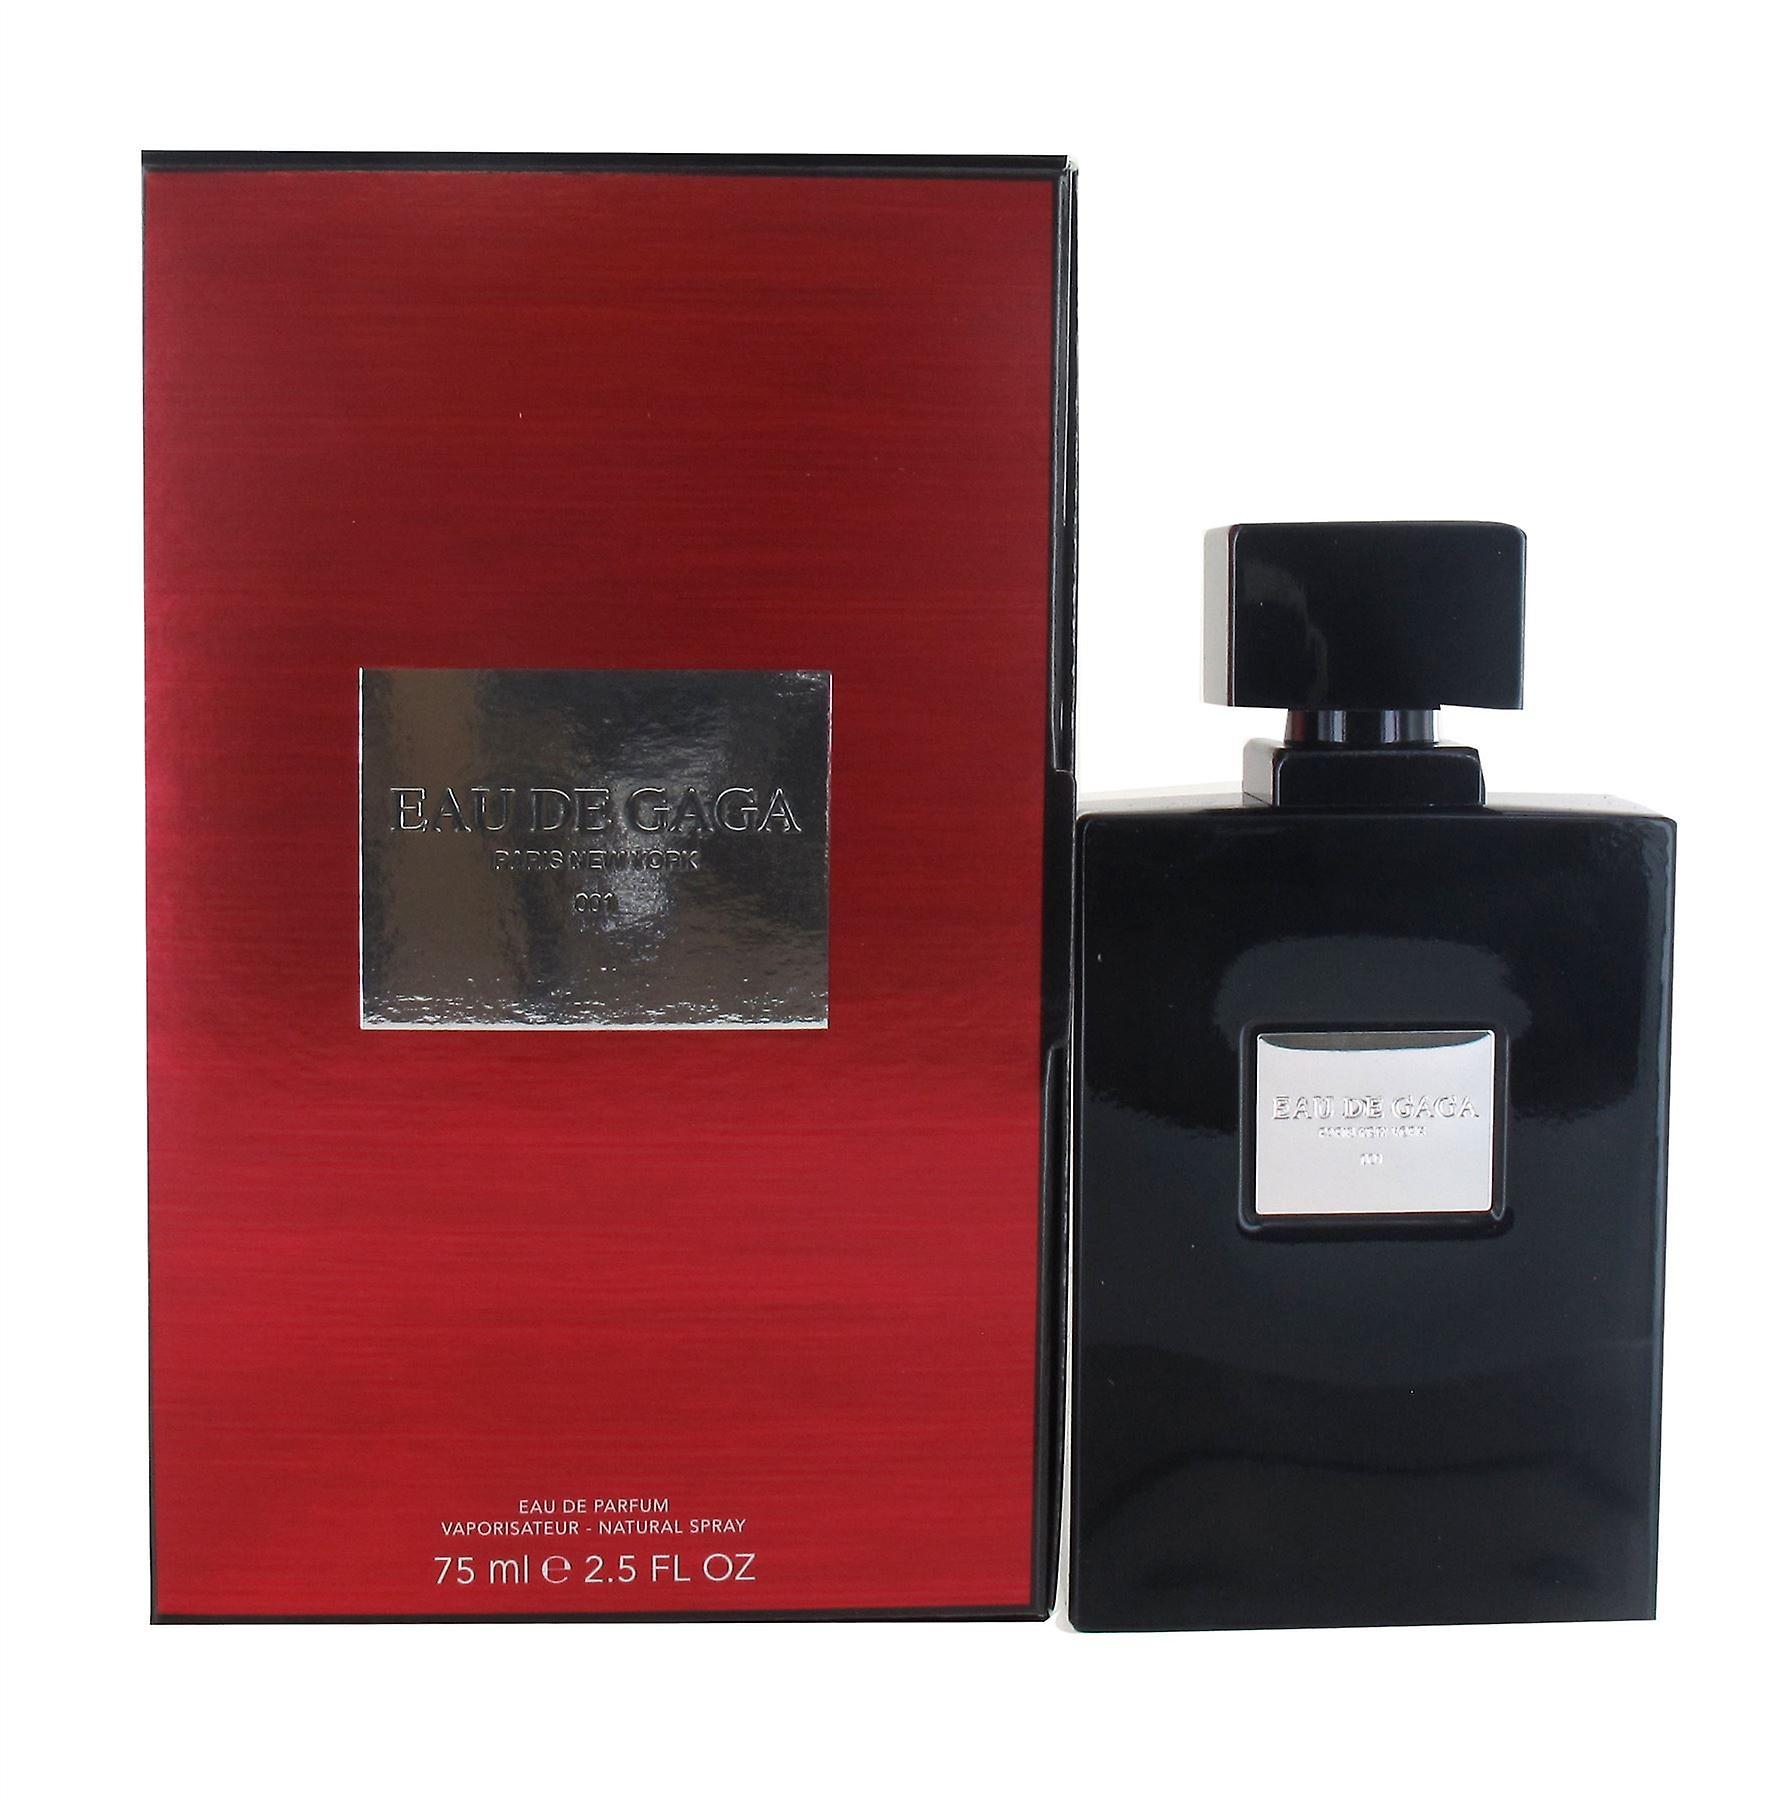 Lady Gaga Eau De Gaga 75ml Eau de Parfum Spray for Women